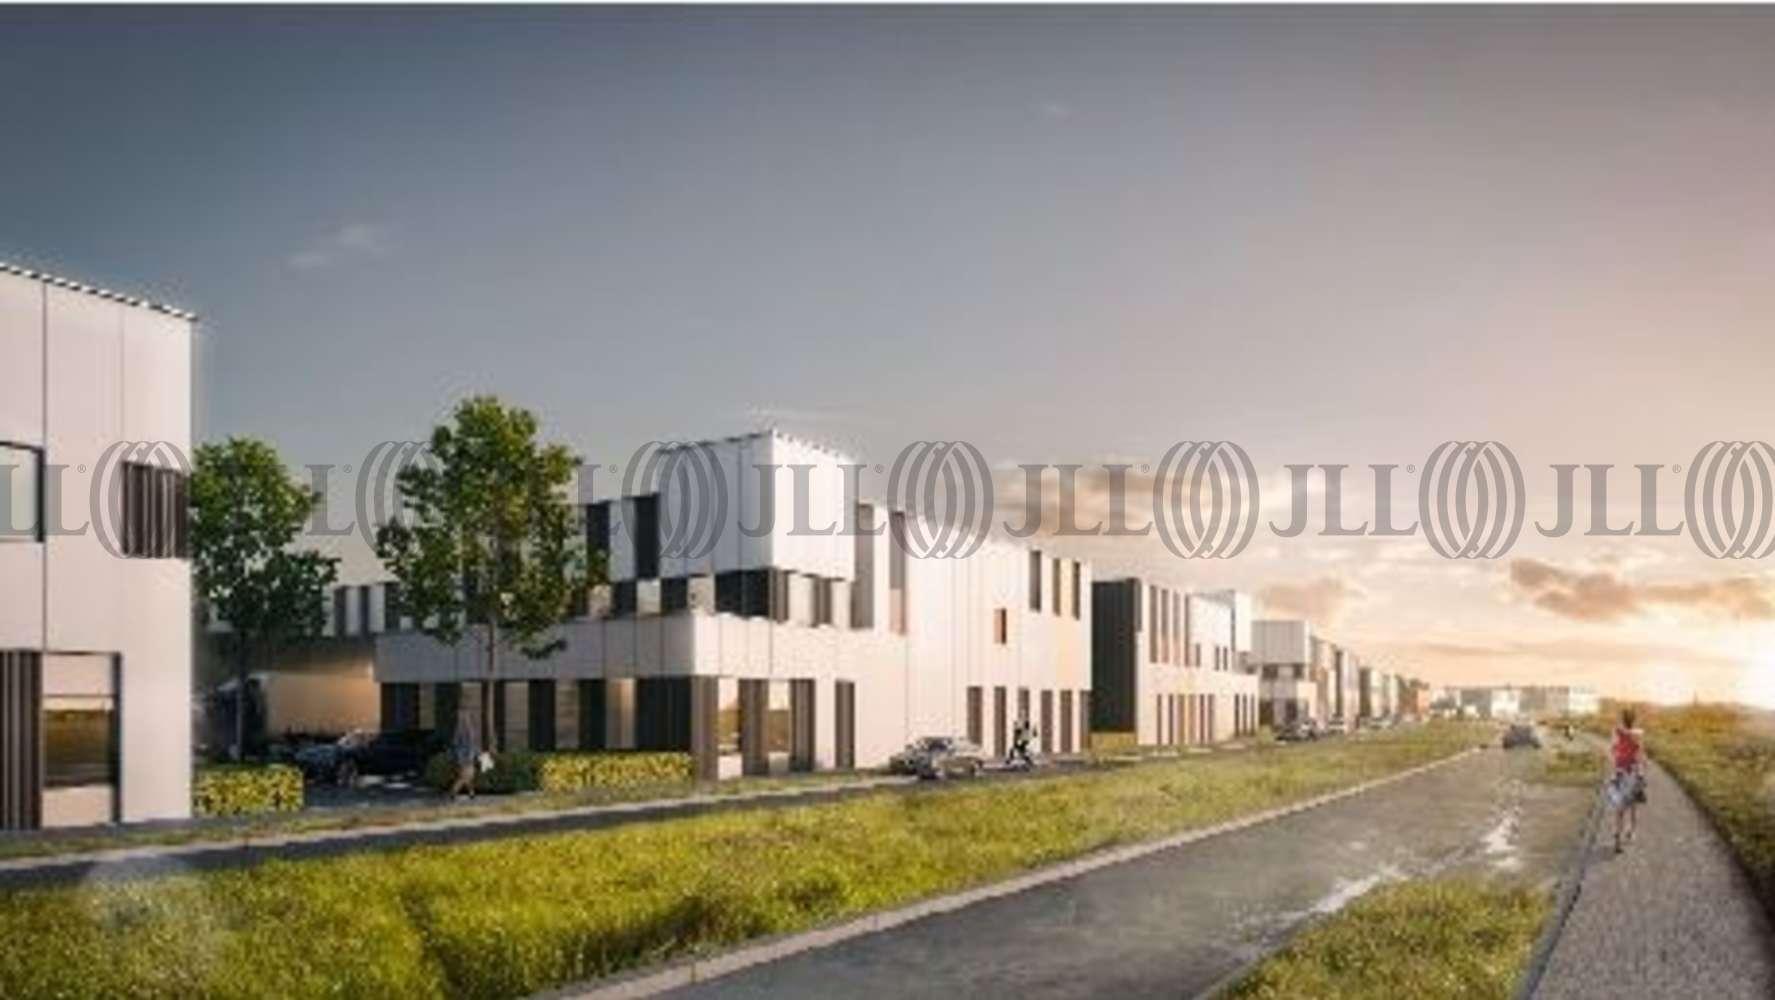 Activités/entrepôt Tremblay en france, 93290 - AEROLIANS BUSINESS CLUSTER - C1 - 10929953